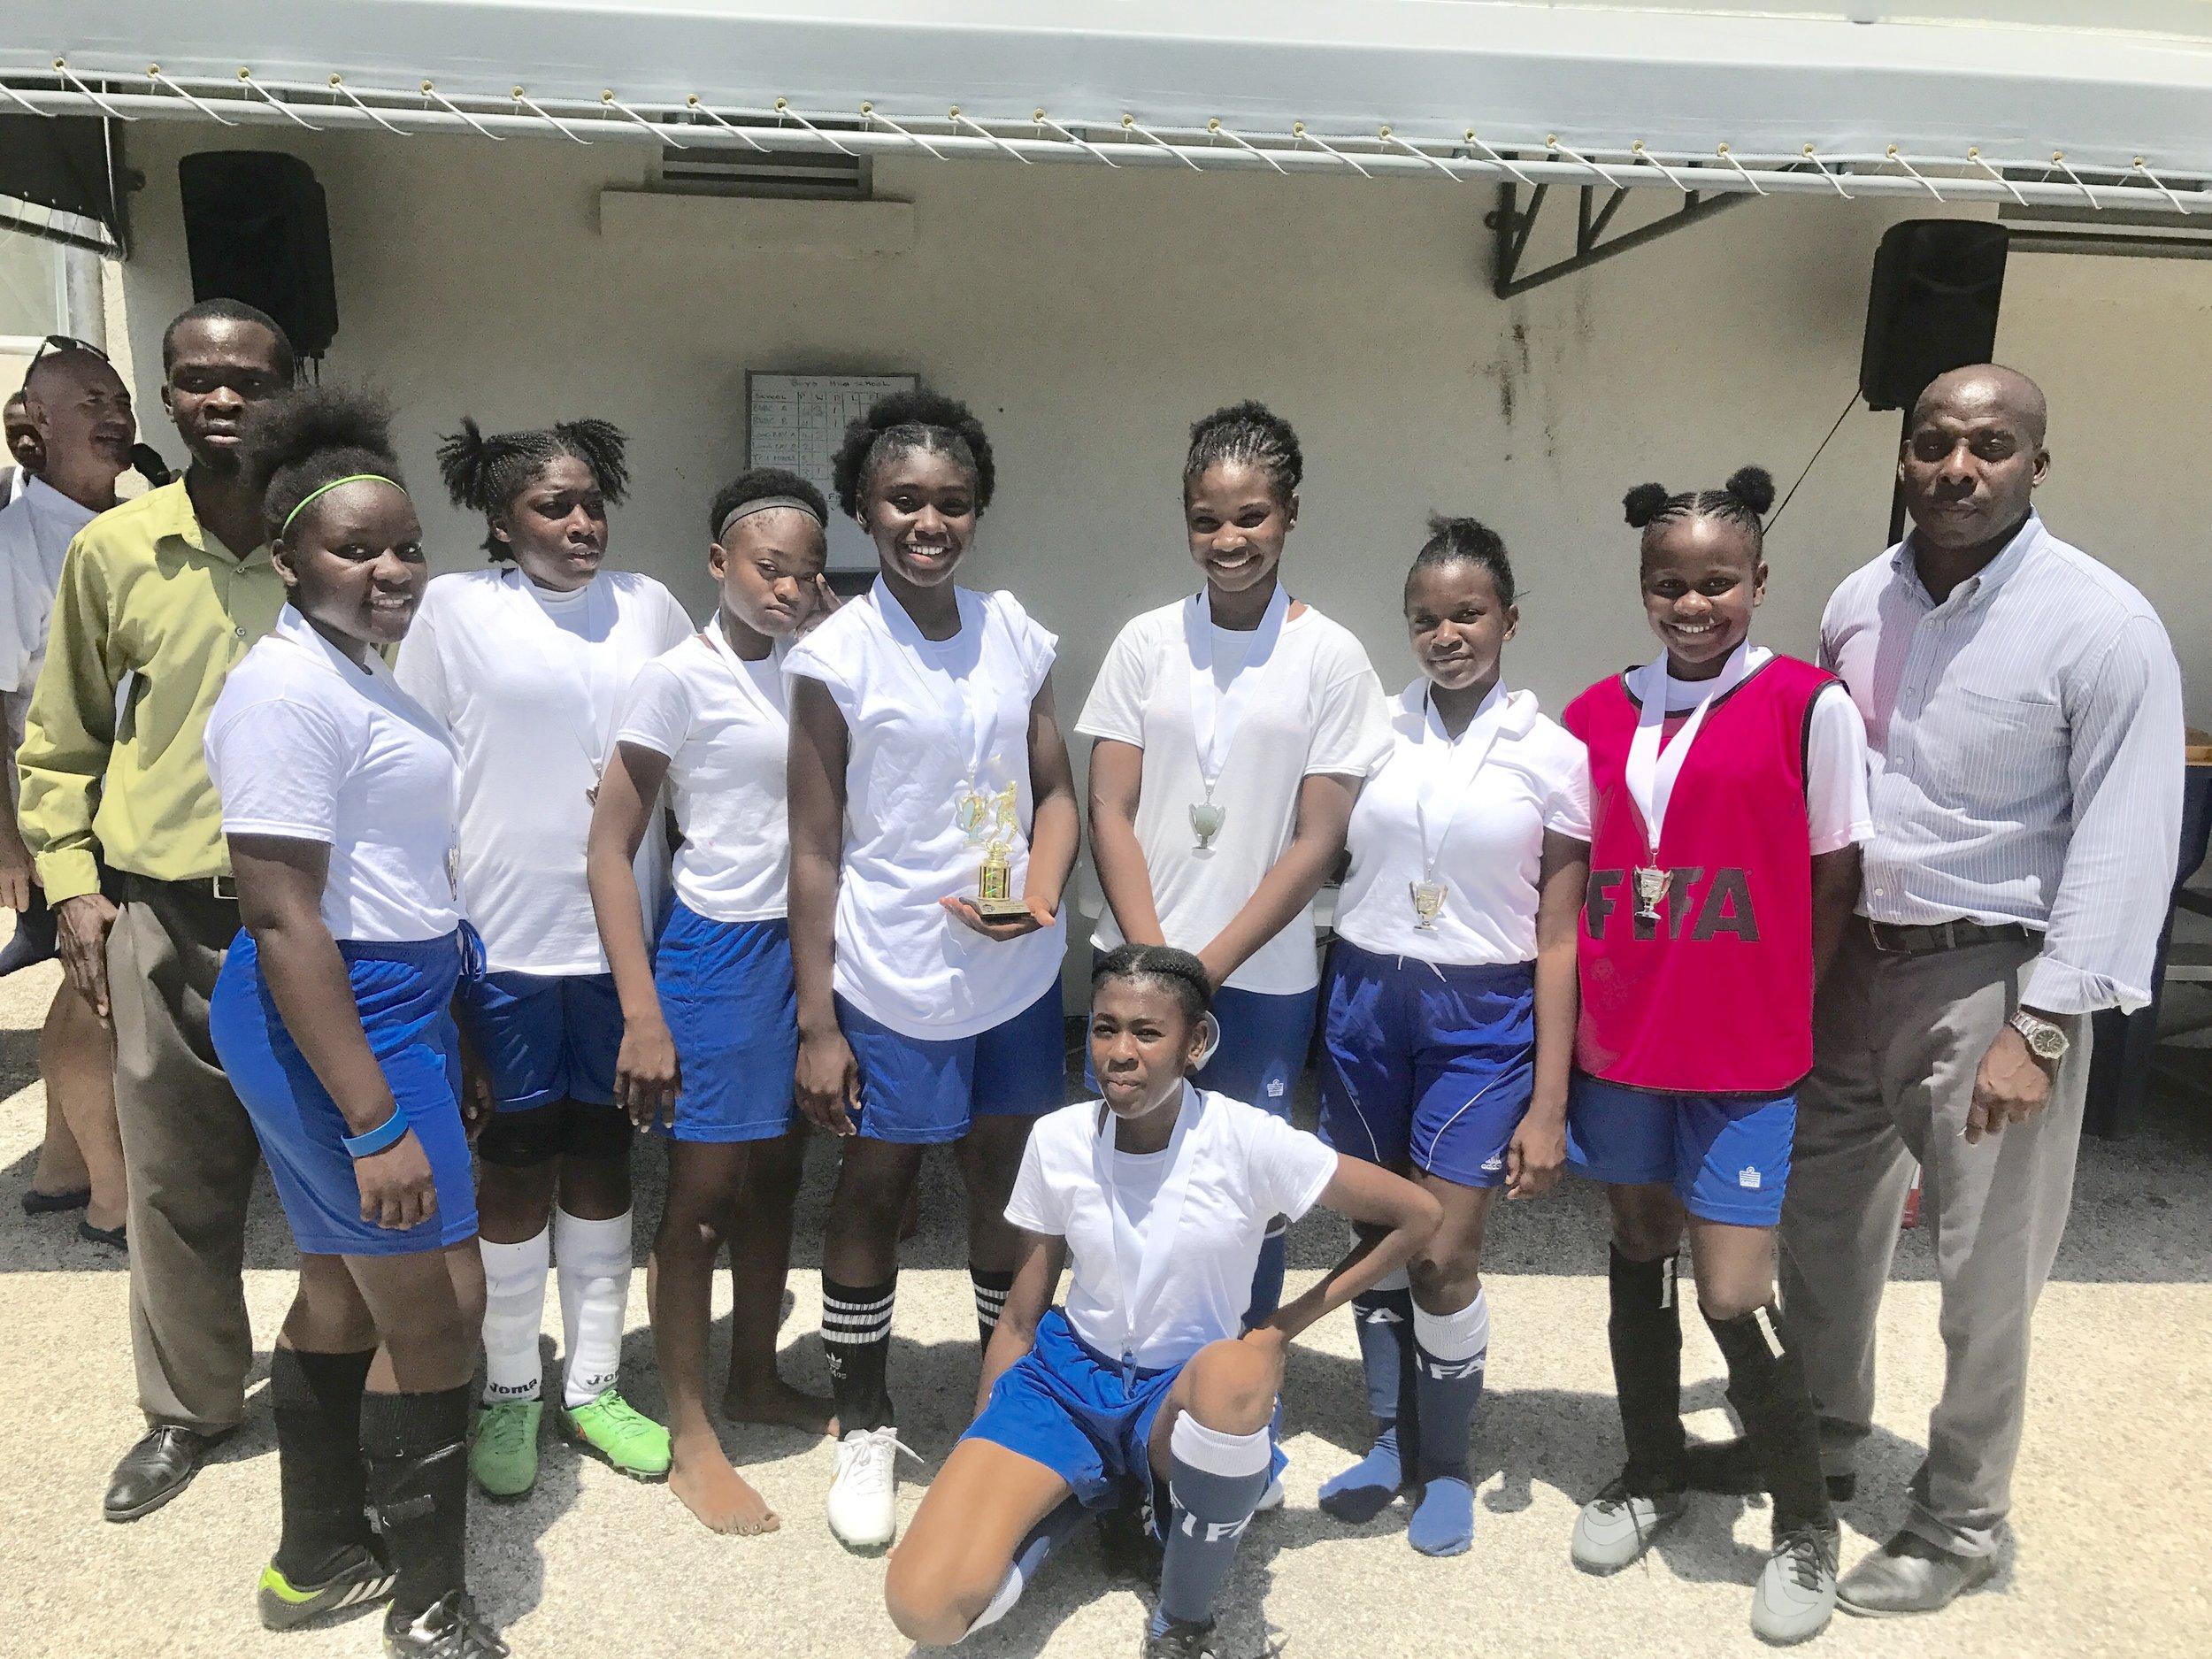 Girls 2nd place, Long Bay High